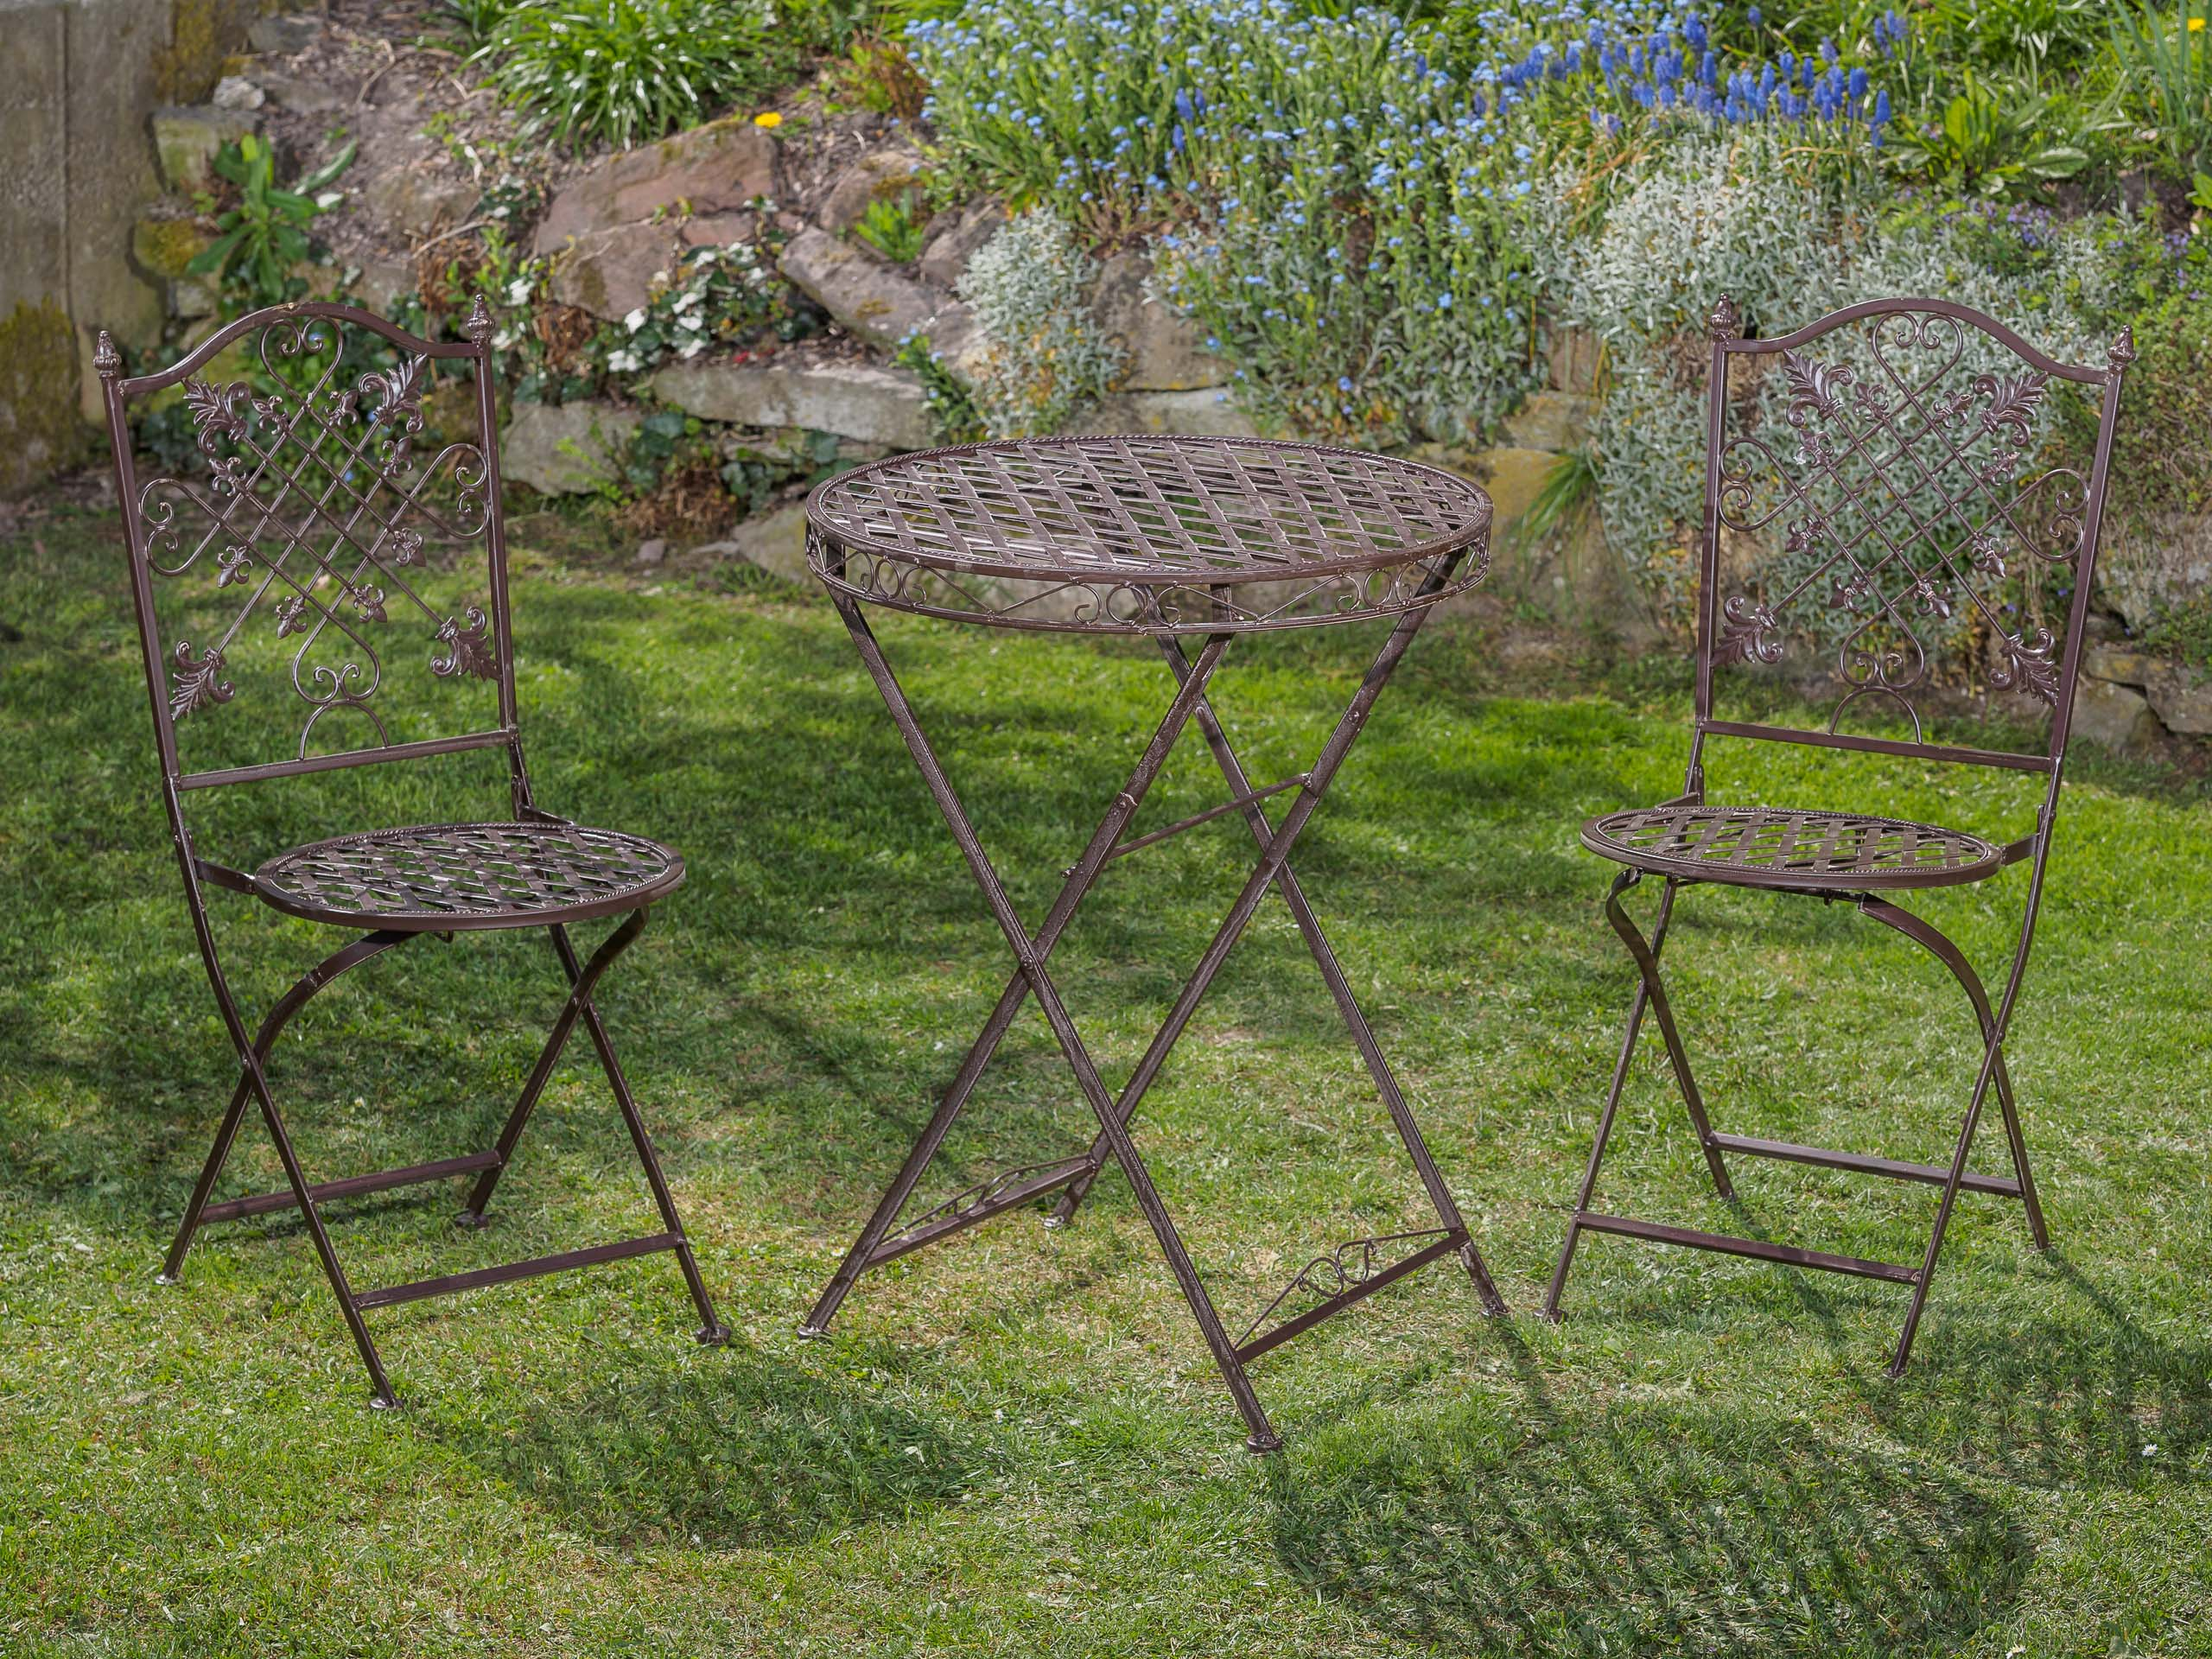 gartentisch und 2 st hle set metall nostalgie antik stil. Black Bedroom Furniture Sets. Home Design Ideas